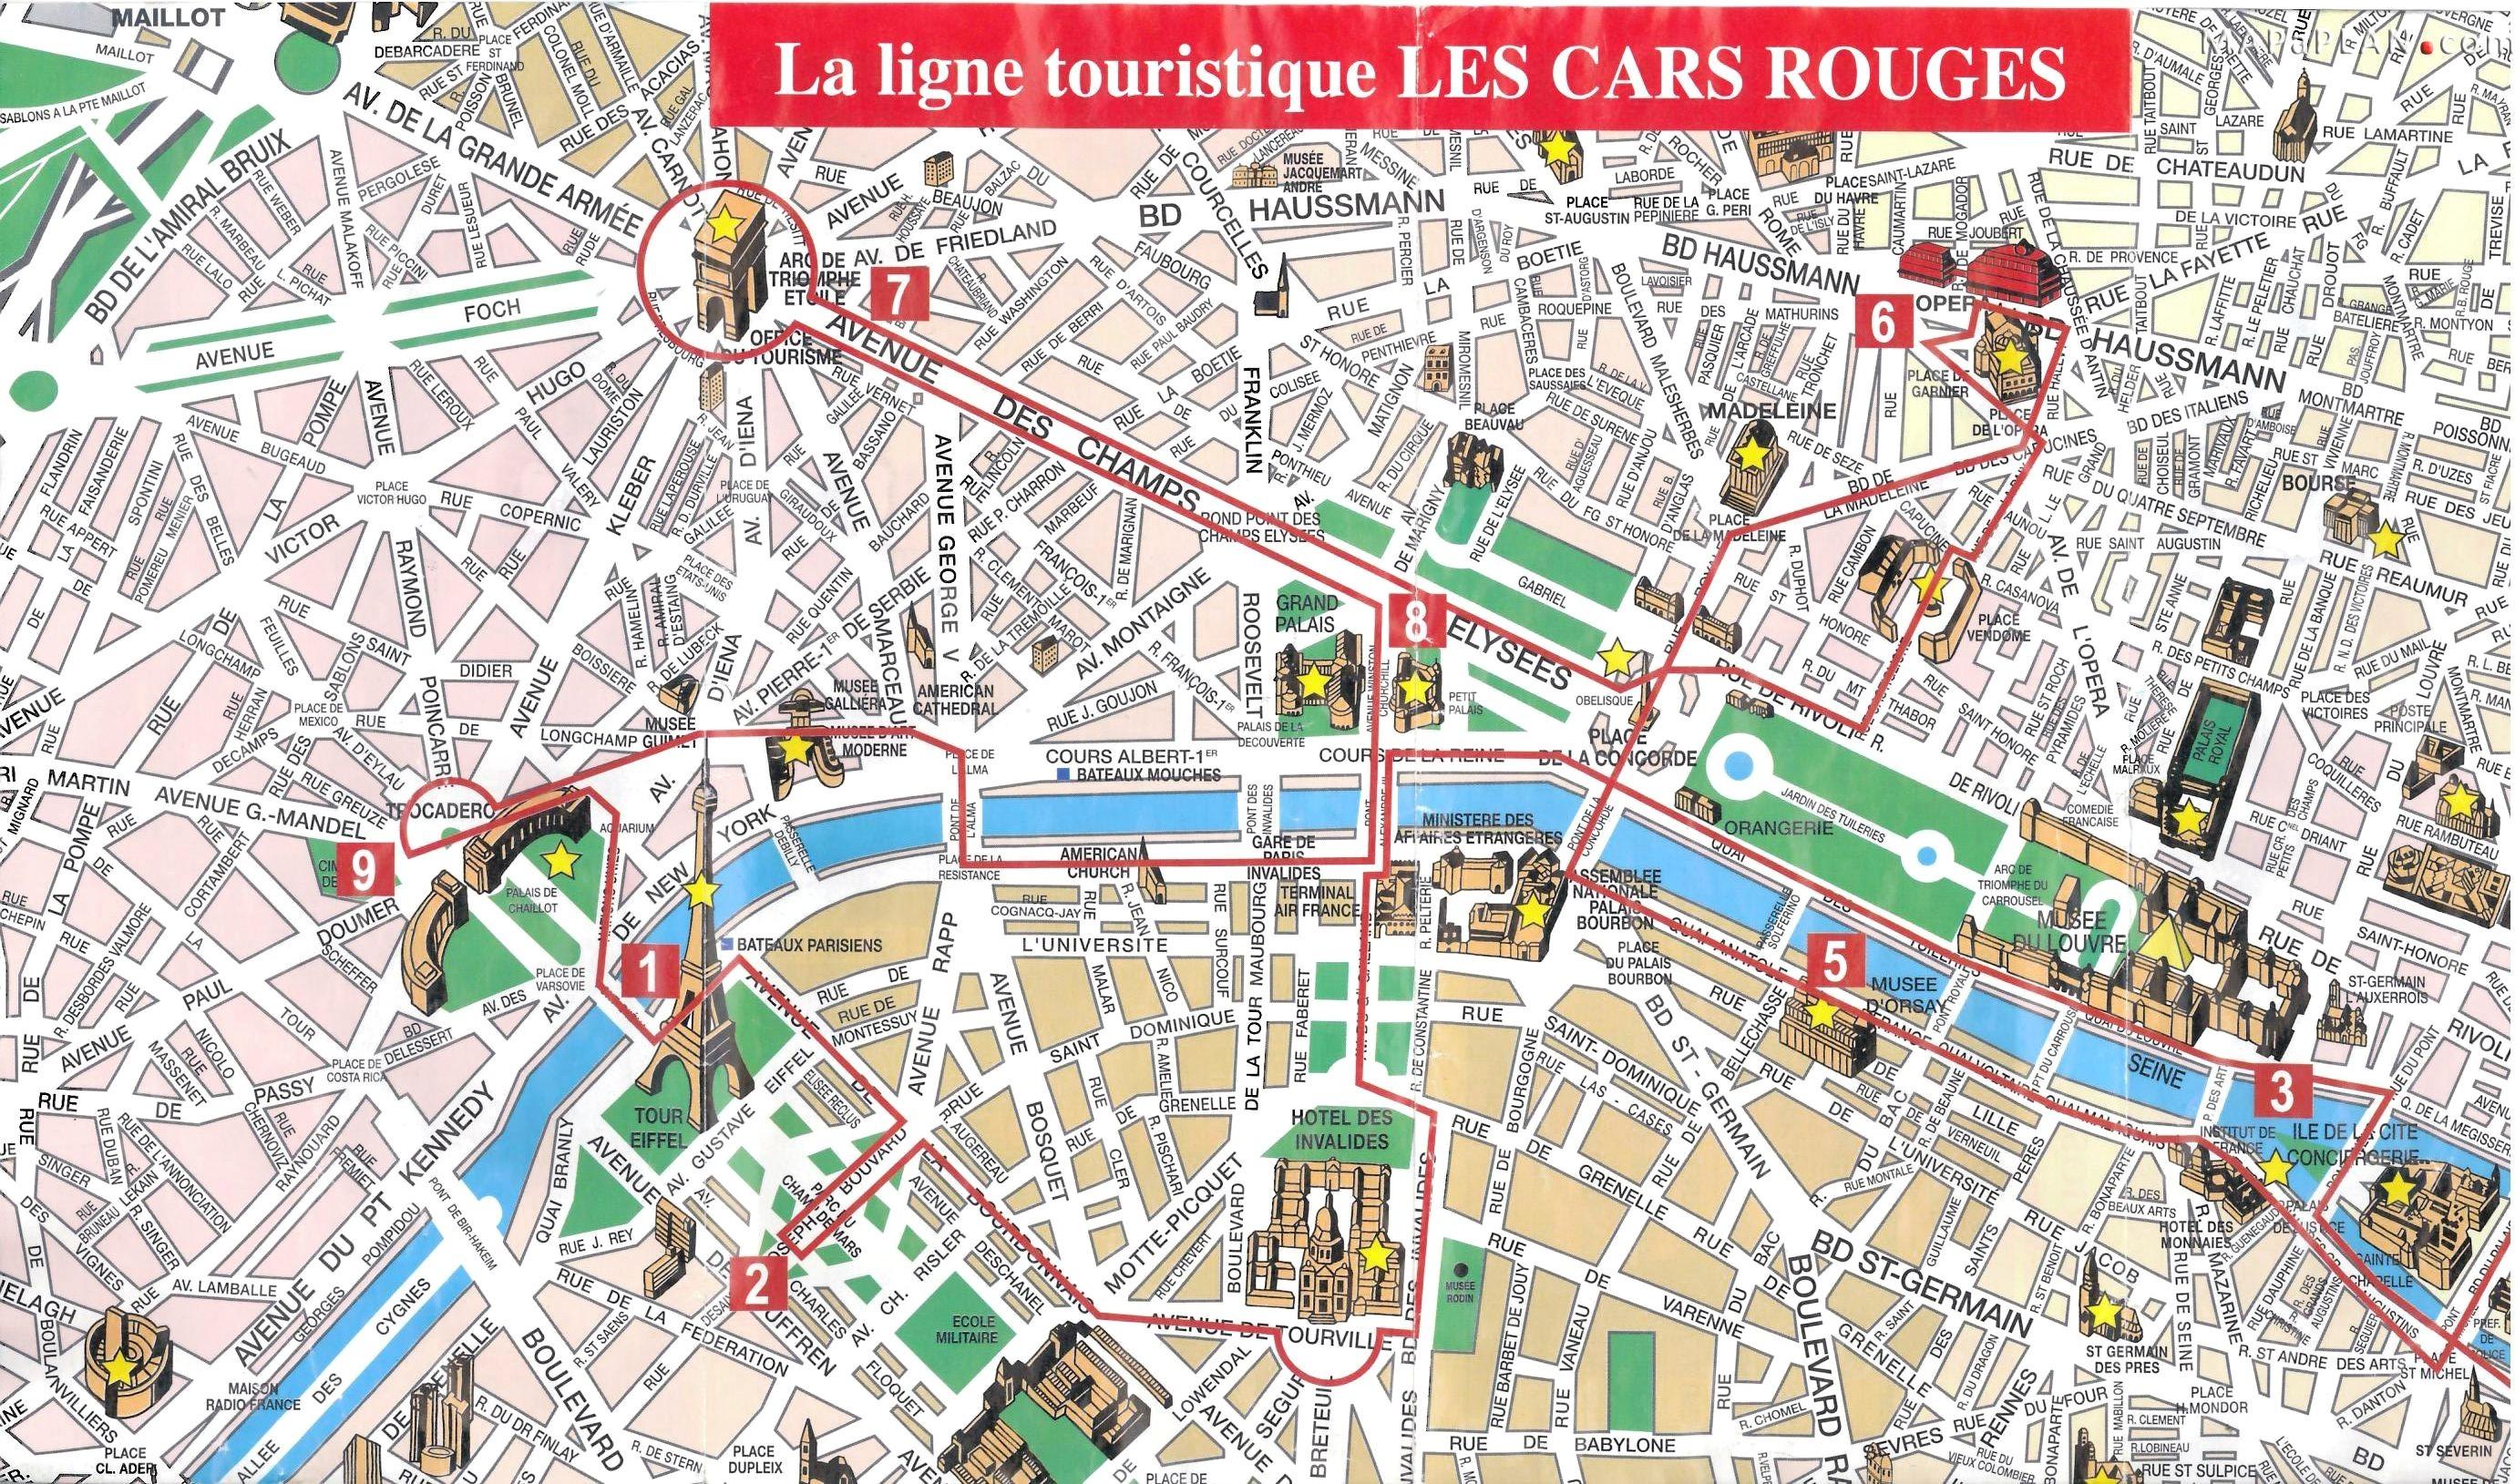 Paris Top Tourist Attractions Map 08 City Sightseeting Route Planner - Paris Map For Tourists Printable